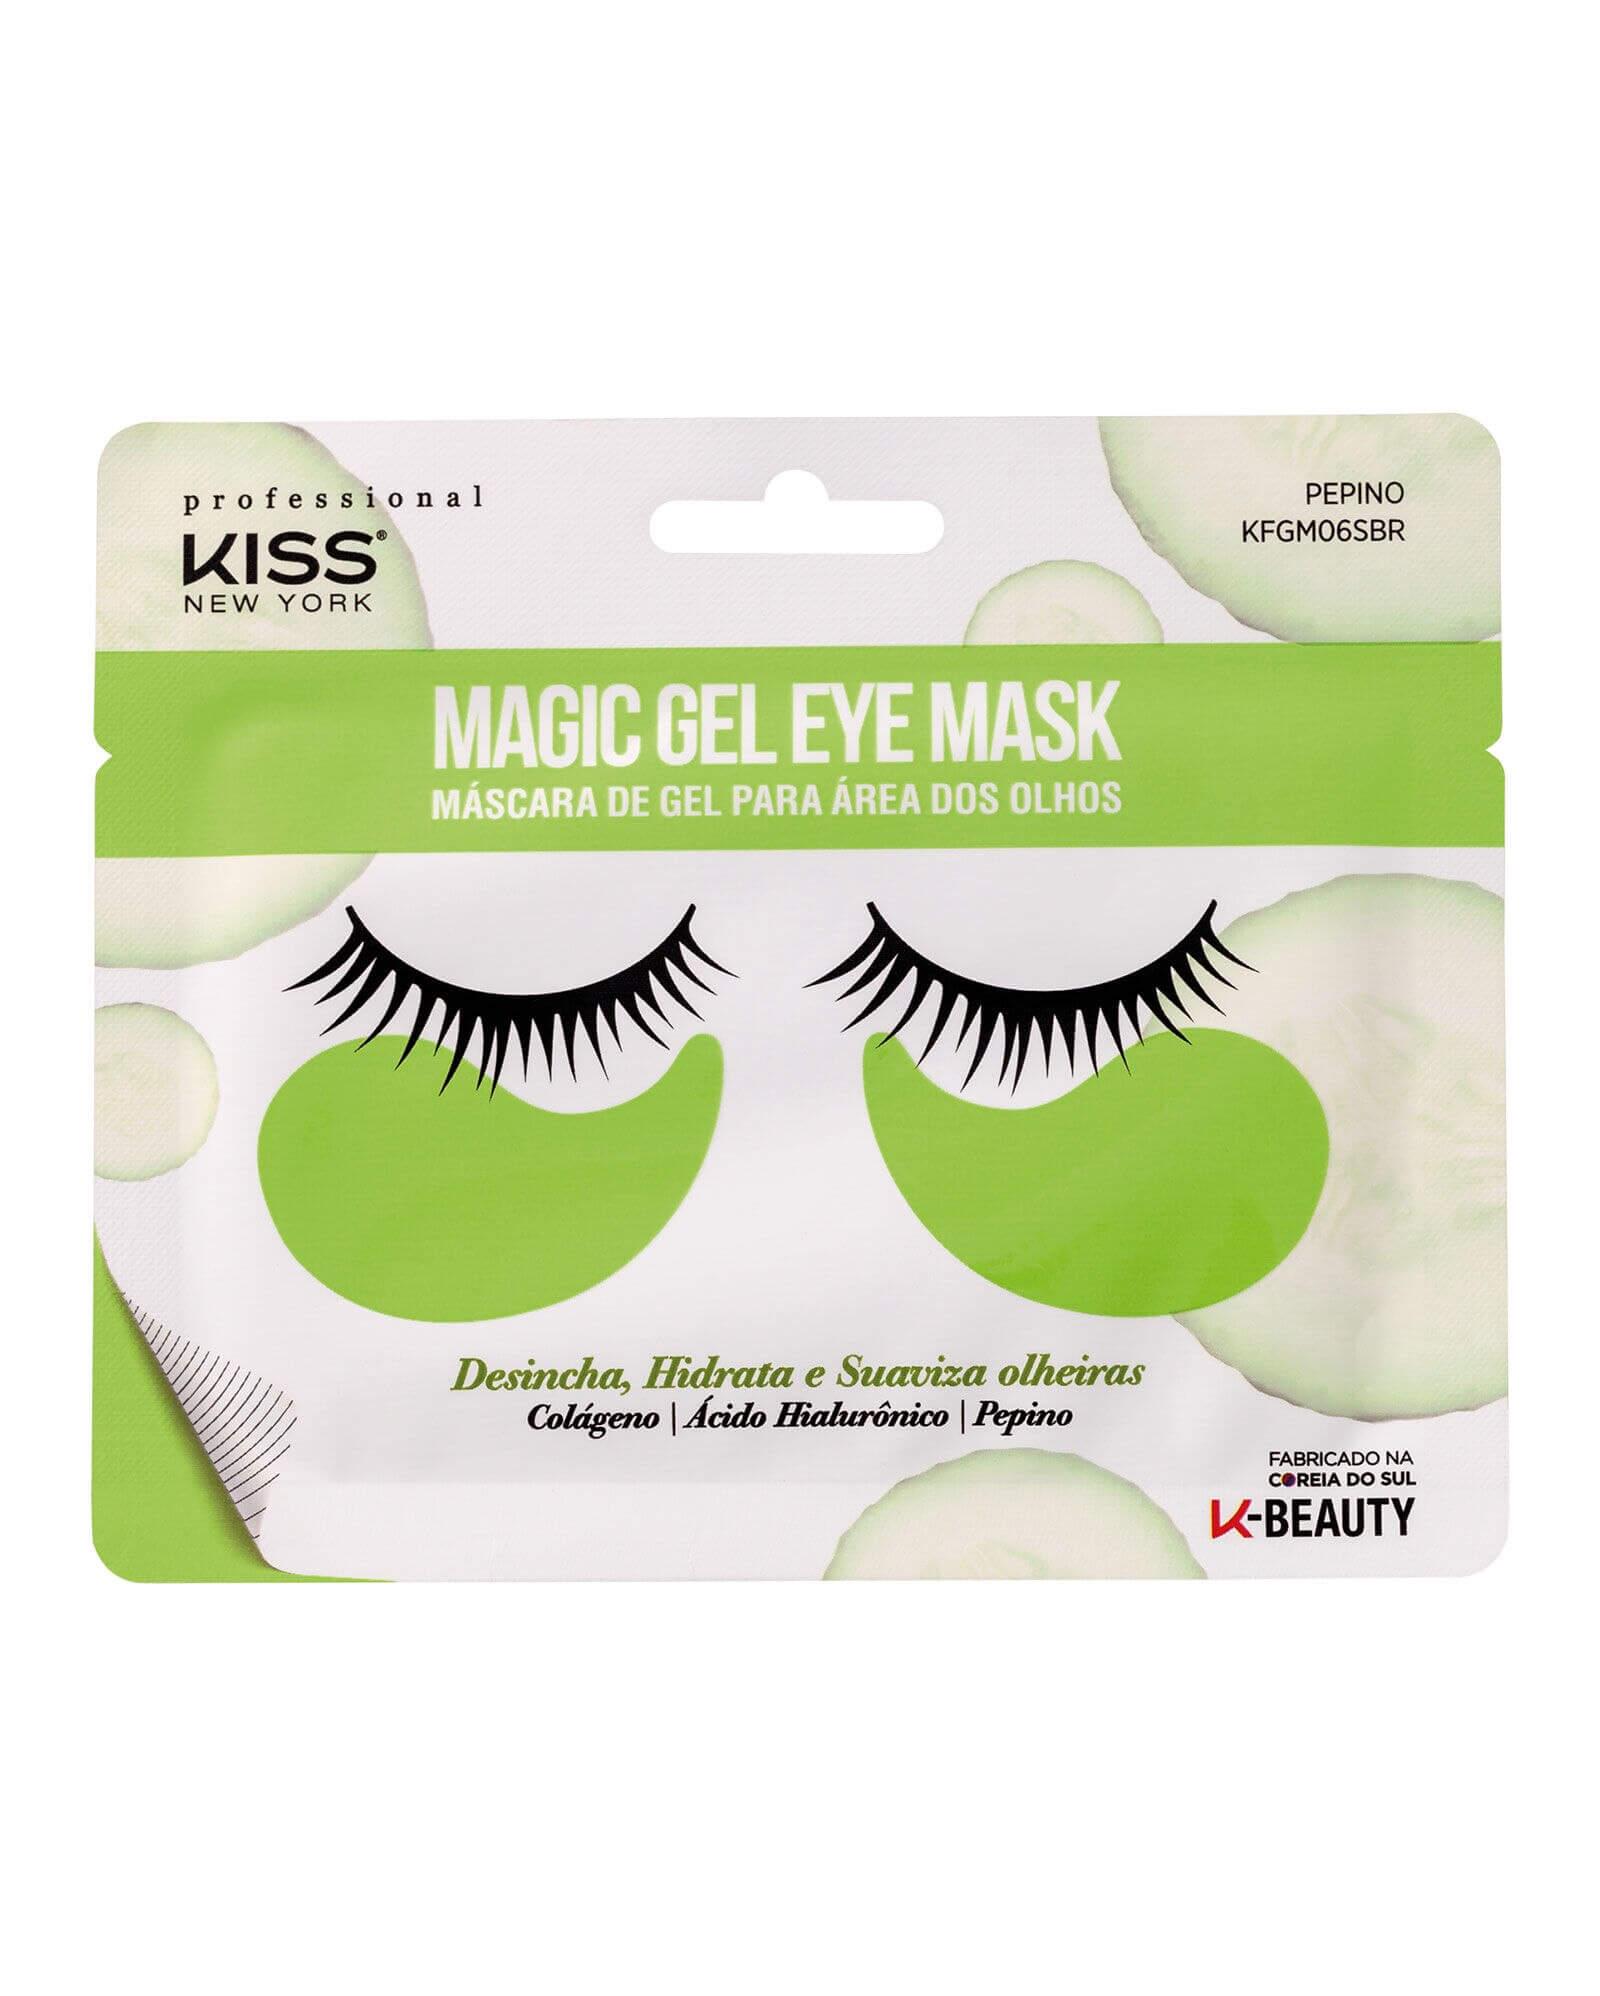 Máscara de Gel Para Área dos Olhos Magic Gel Eye Mask Pepino Kiss New York 7g